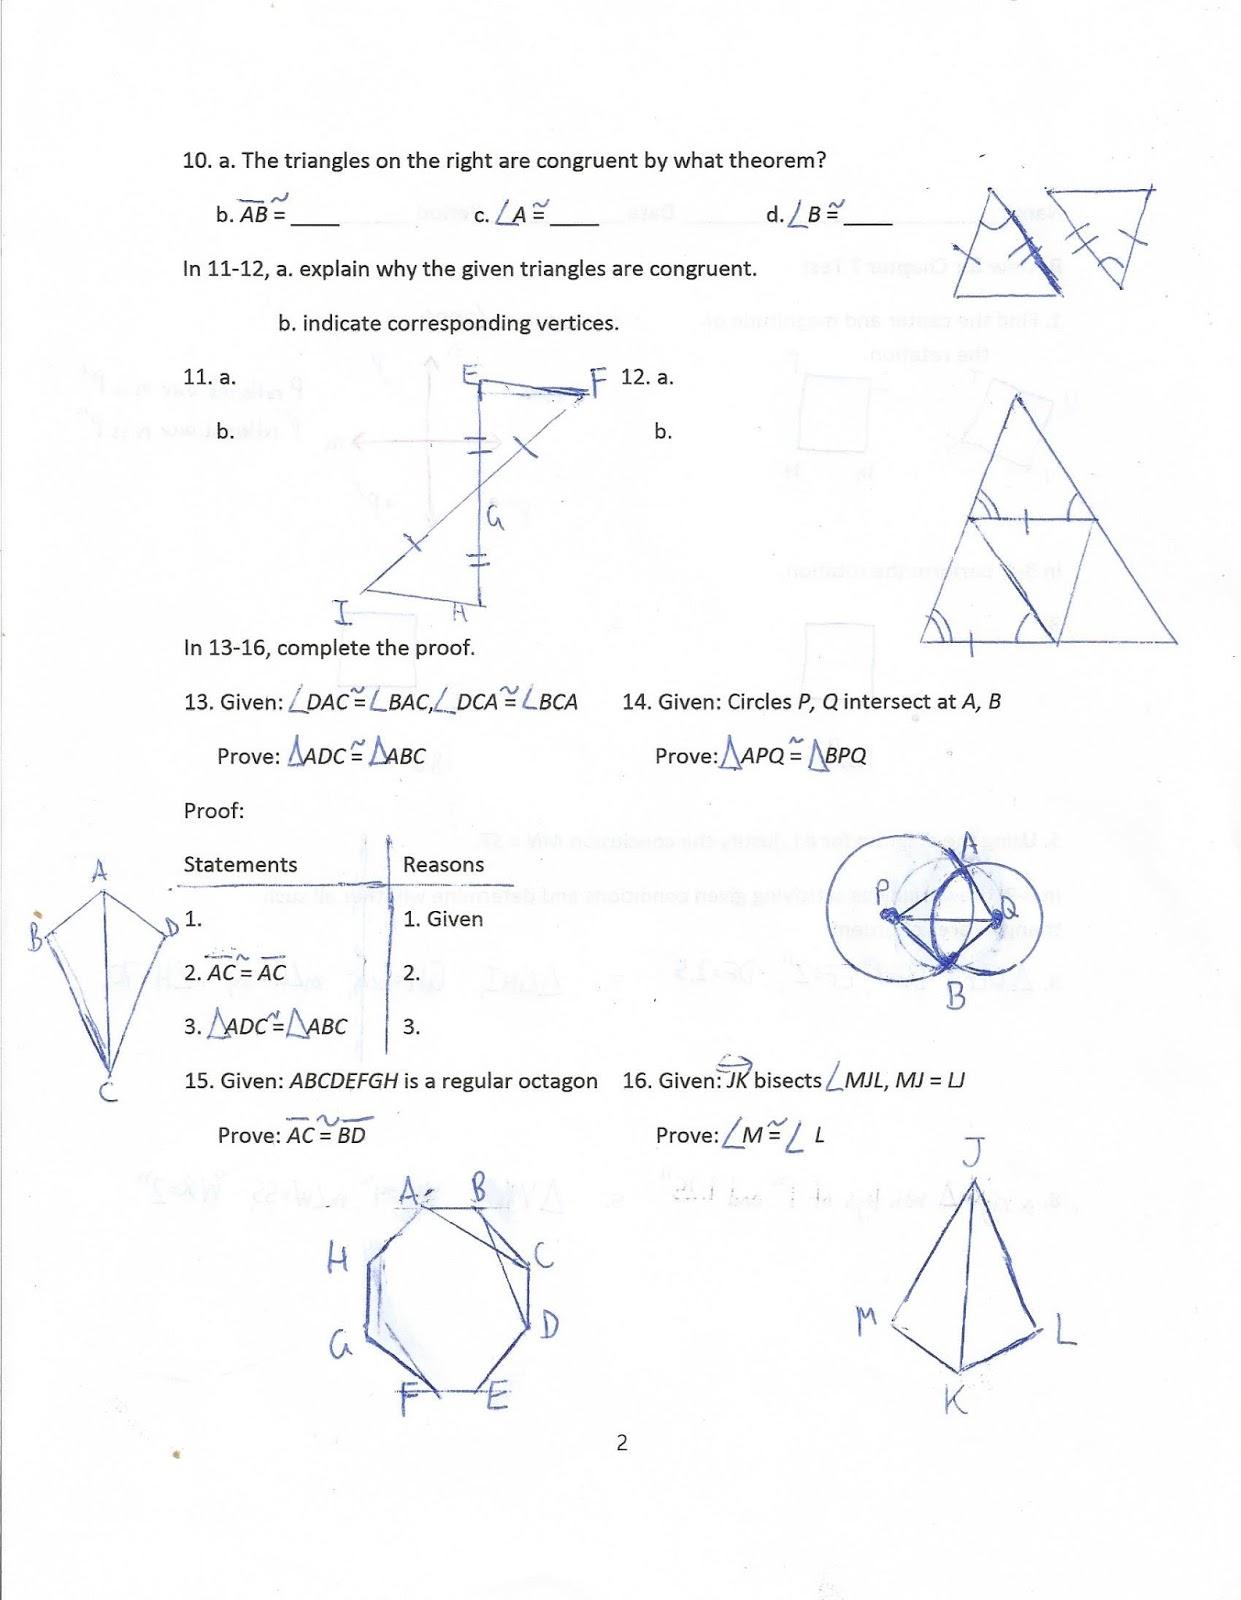 Geometry, Common Core Style: October 2015